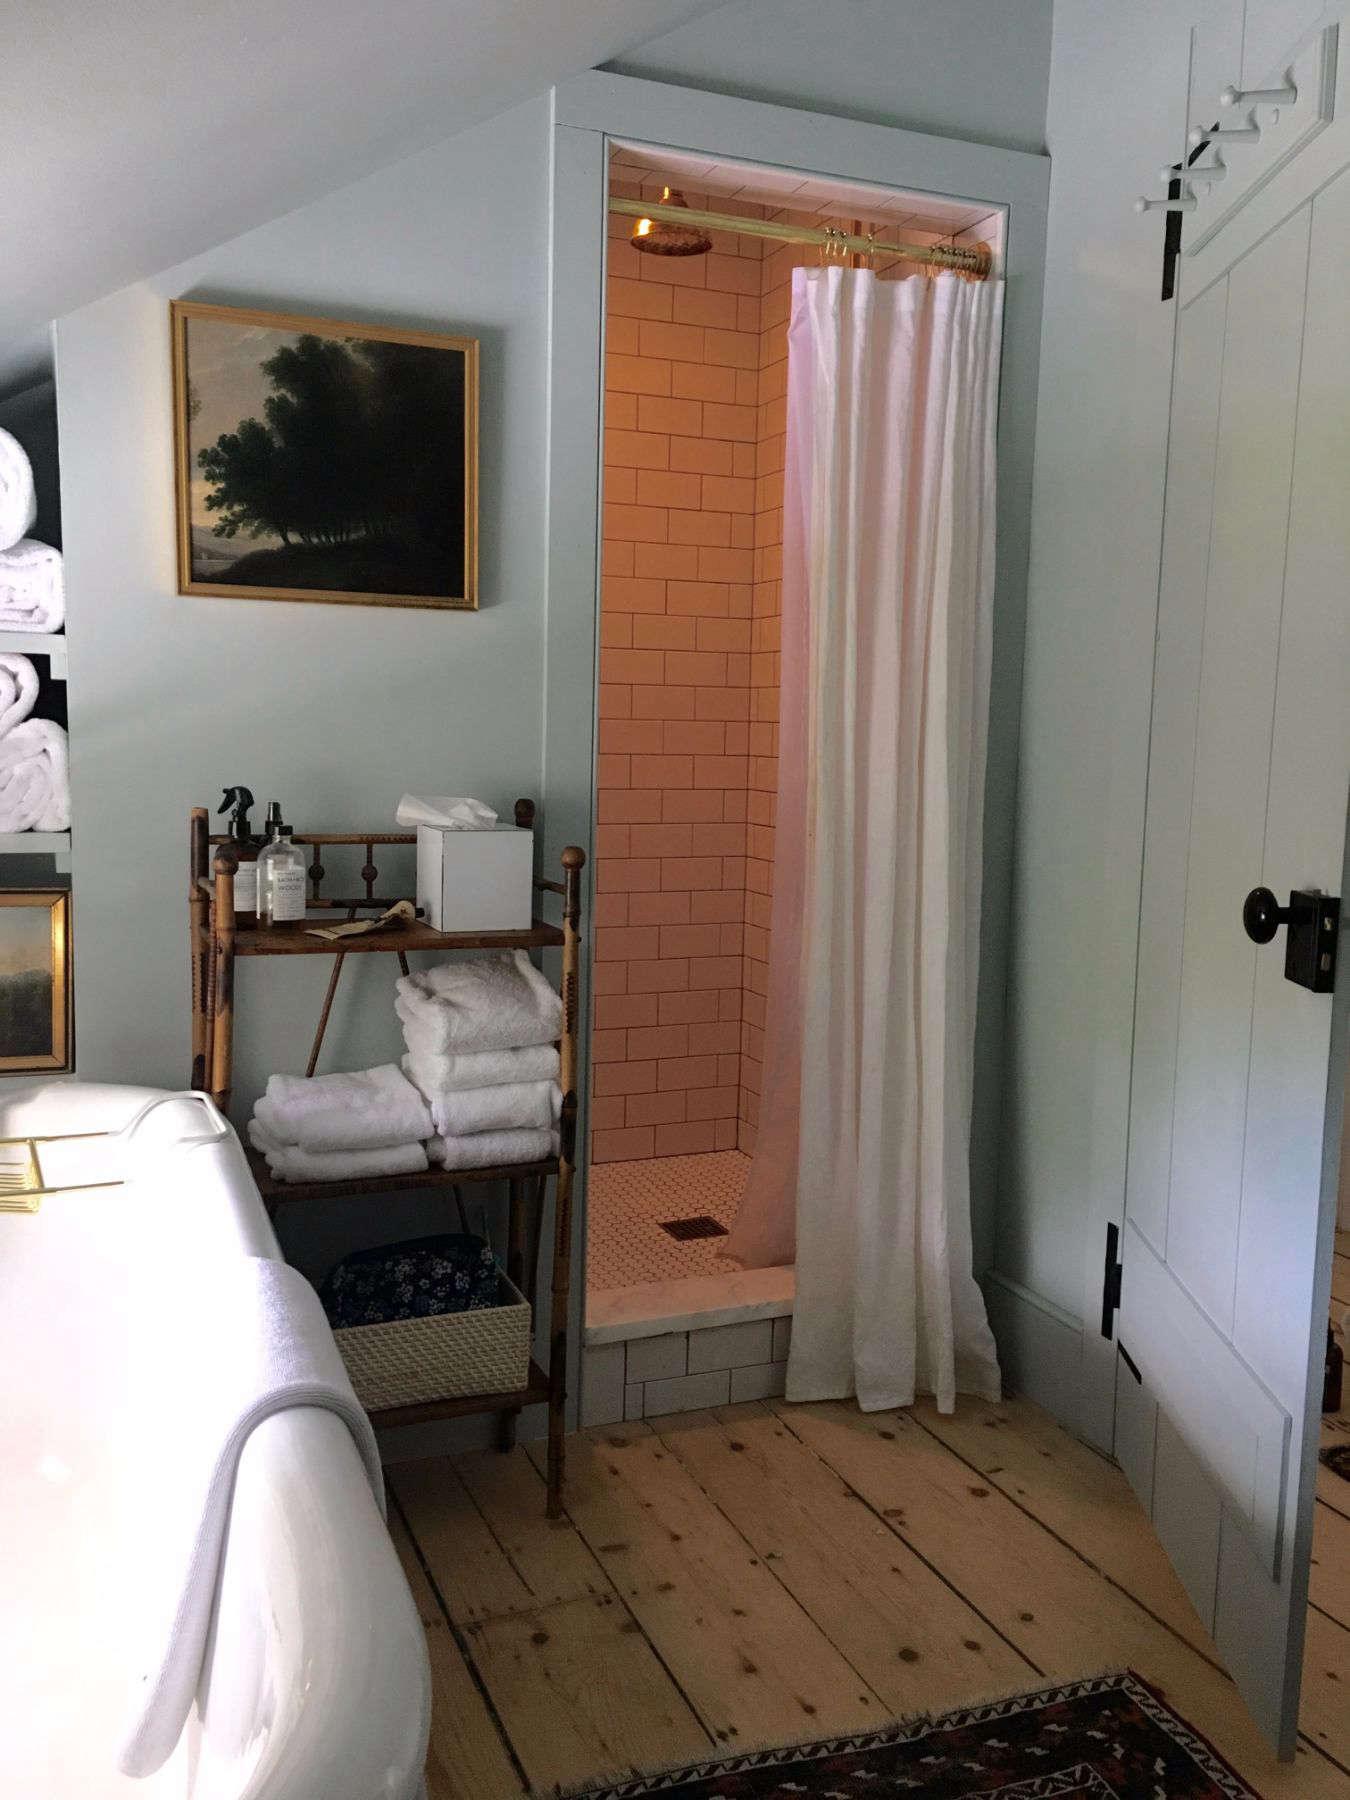 Best Amateur Bathroom: Juliet Feehan's Hudson Valley Farmhouse Bath